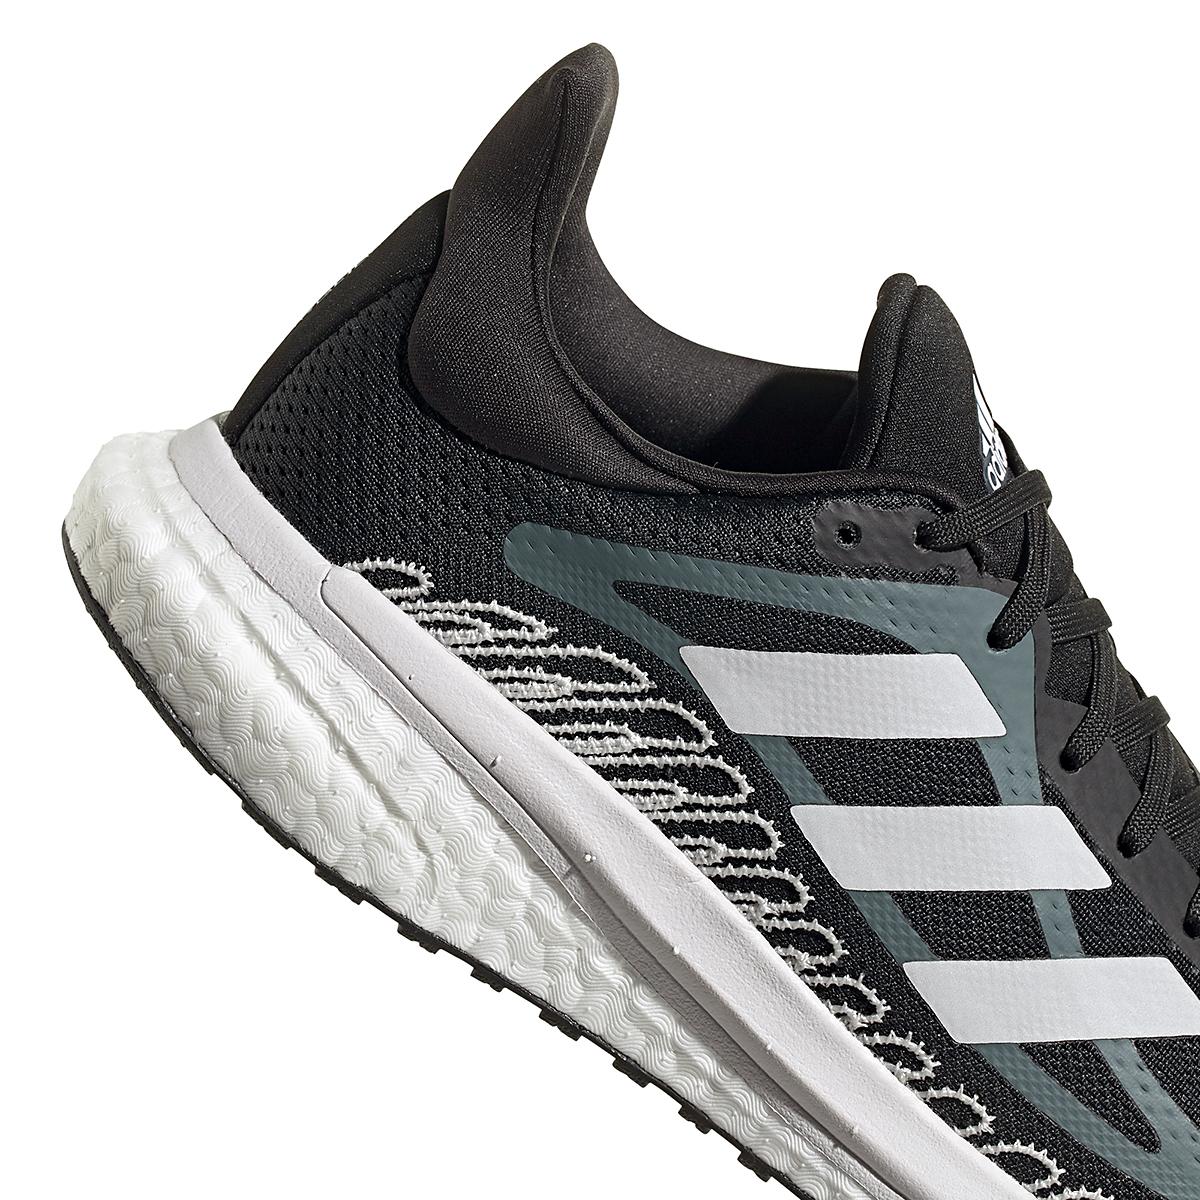 Women's Adidas Solar Glide ST 3 Running Shoe - Color: Core Black - Size: 5 - Width: Regular, Core Black, large, image 4